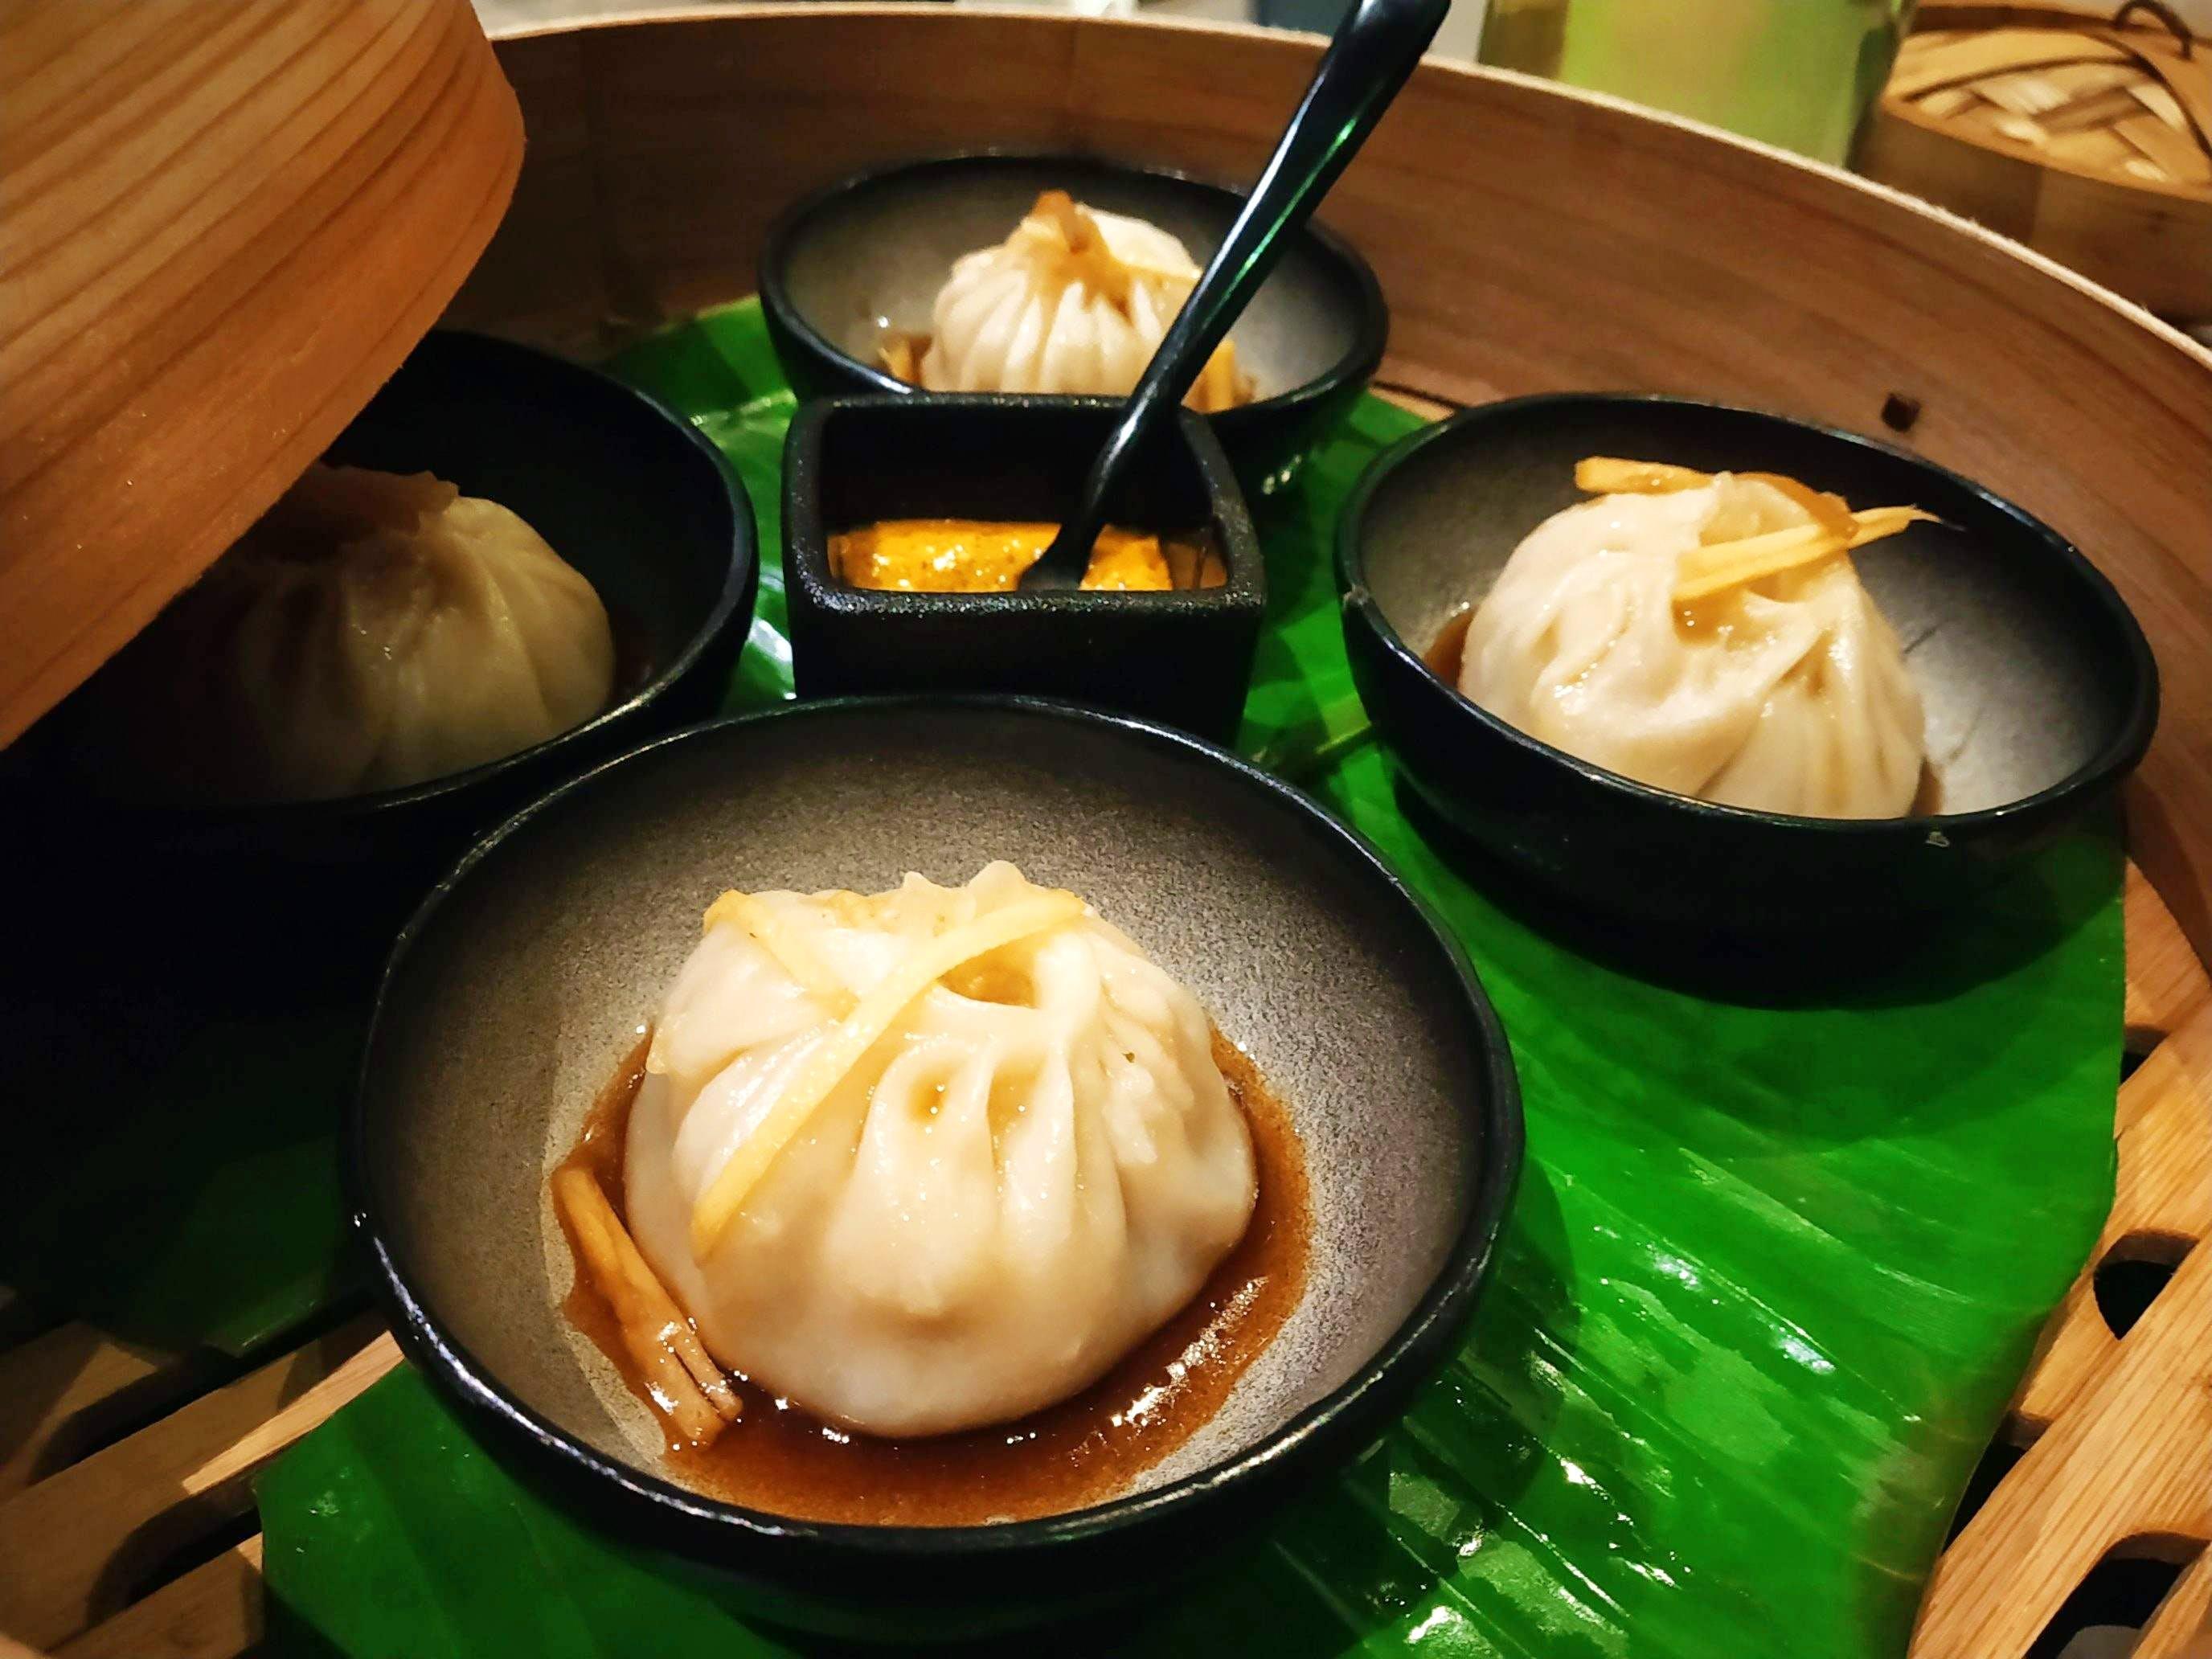 Dish,Food,Cuisine,Xiaolongbao,Ingredient,Momo,Dim sum,Chinese food,Siopao,Dumpling